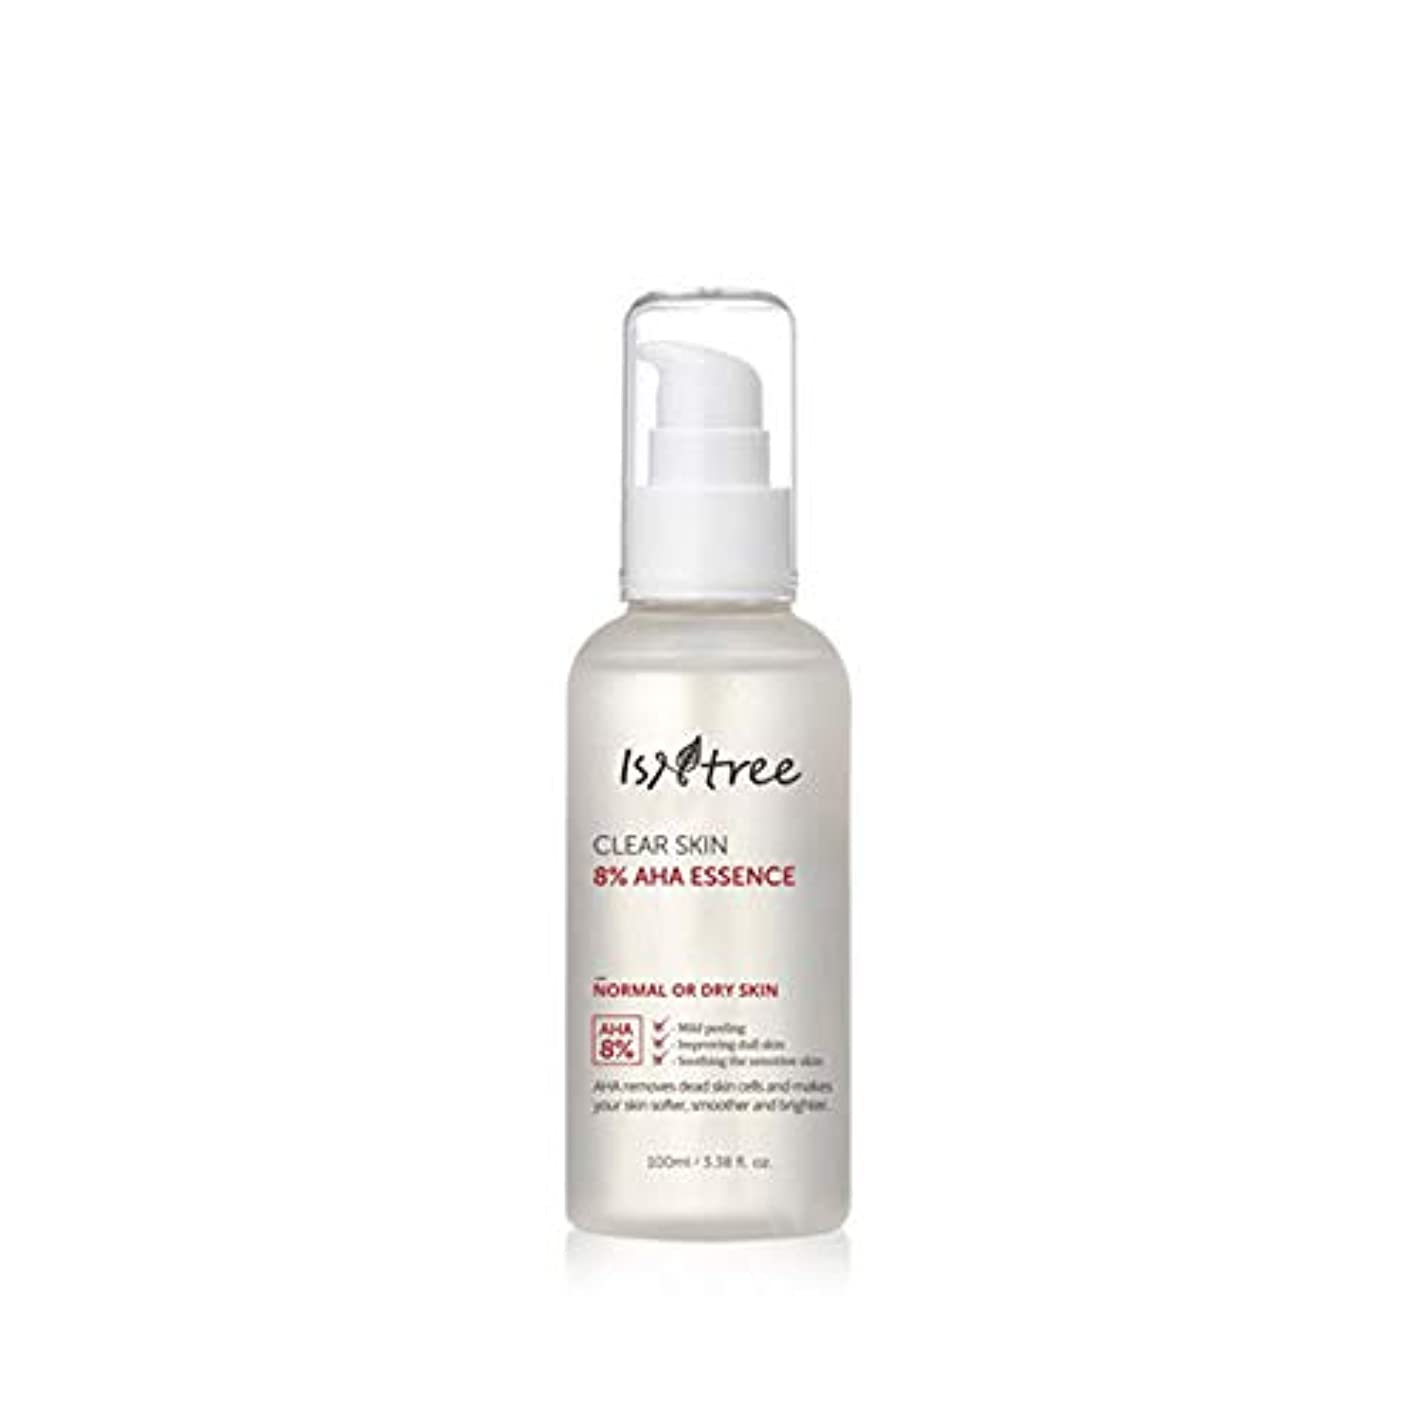 [IsNtree/イズアンドツリー] Clear Skin 8% AHA Essence 100ml/クリア スキン 8% AHA エッセンス 100ml 韓国コスメ 角質 美容液 [並行輸入品]